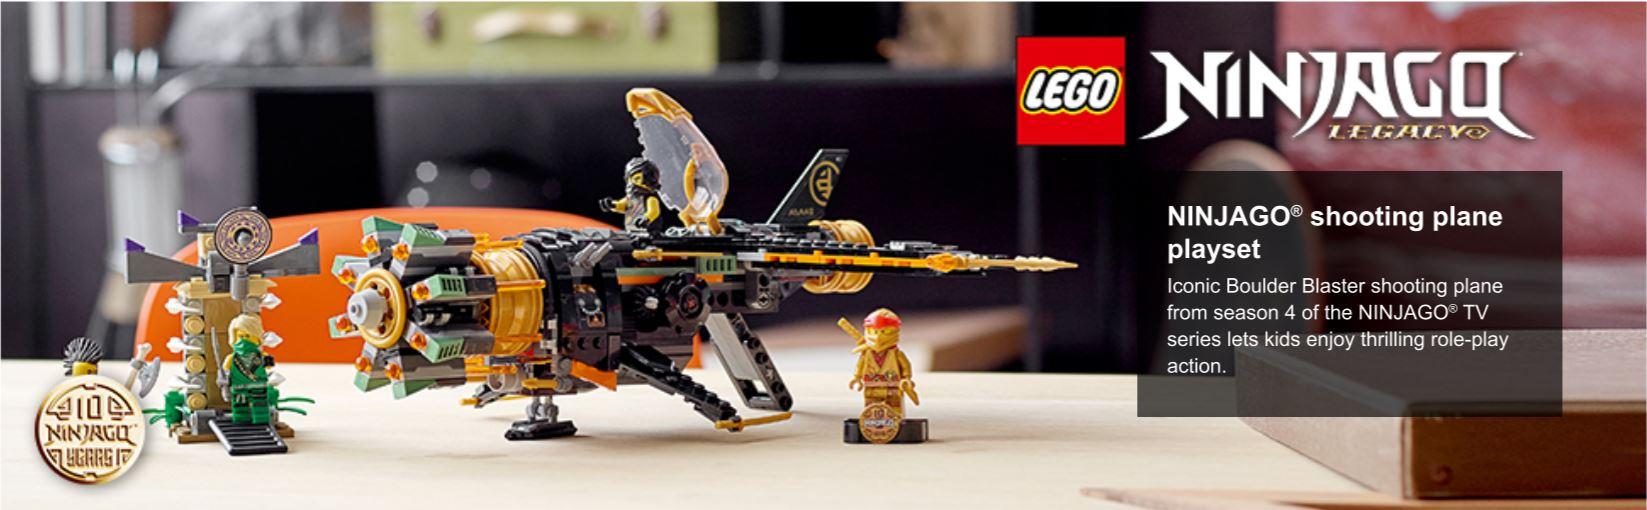 lego ninja plane set